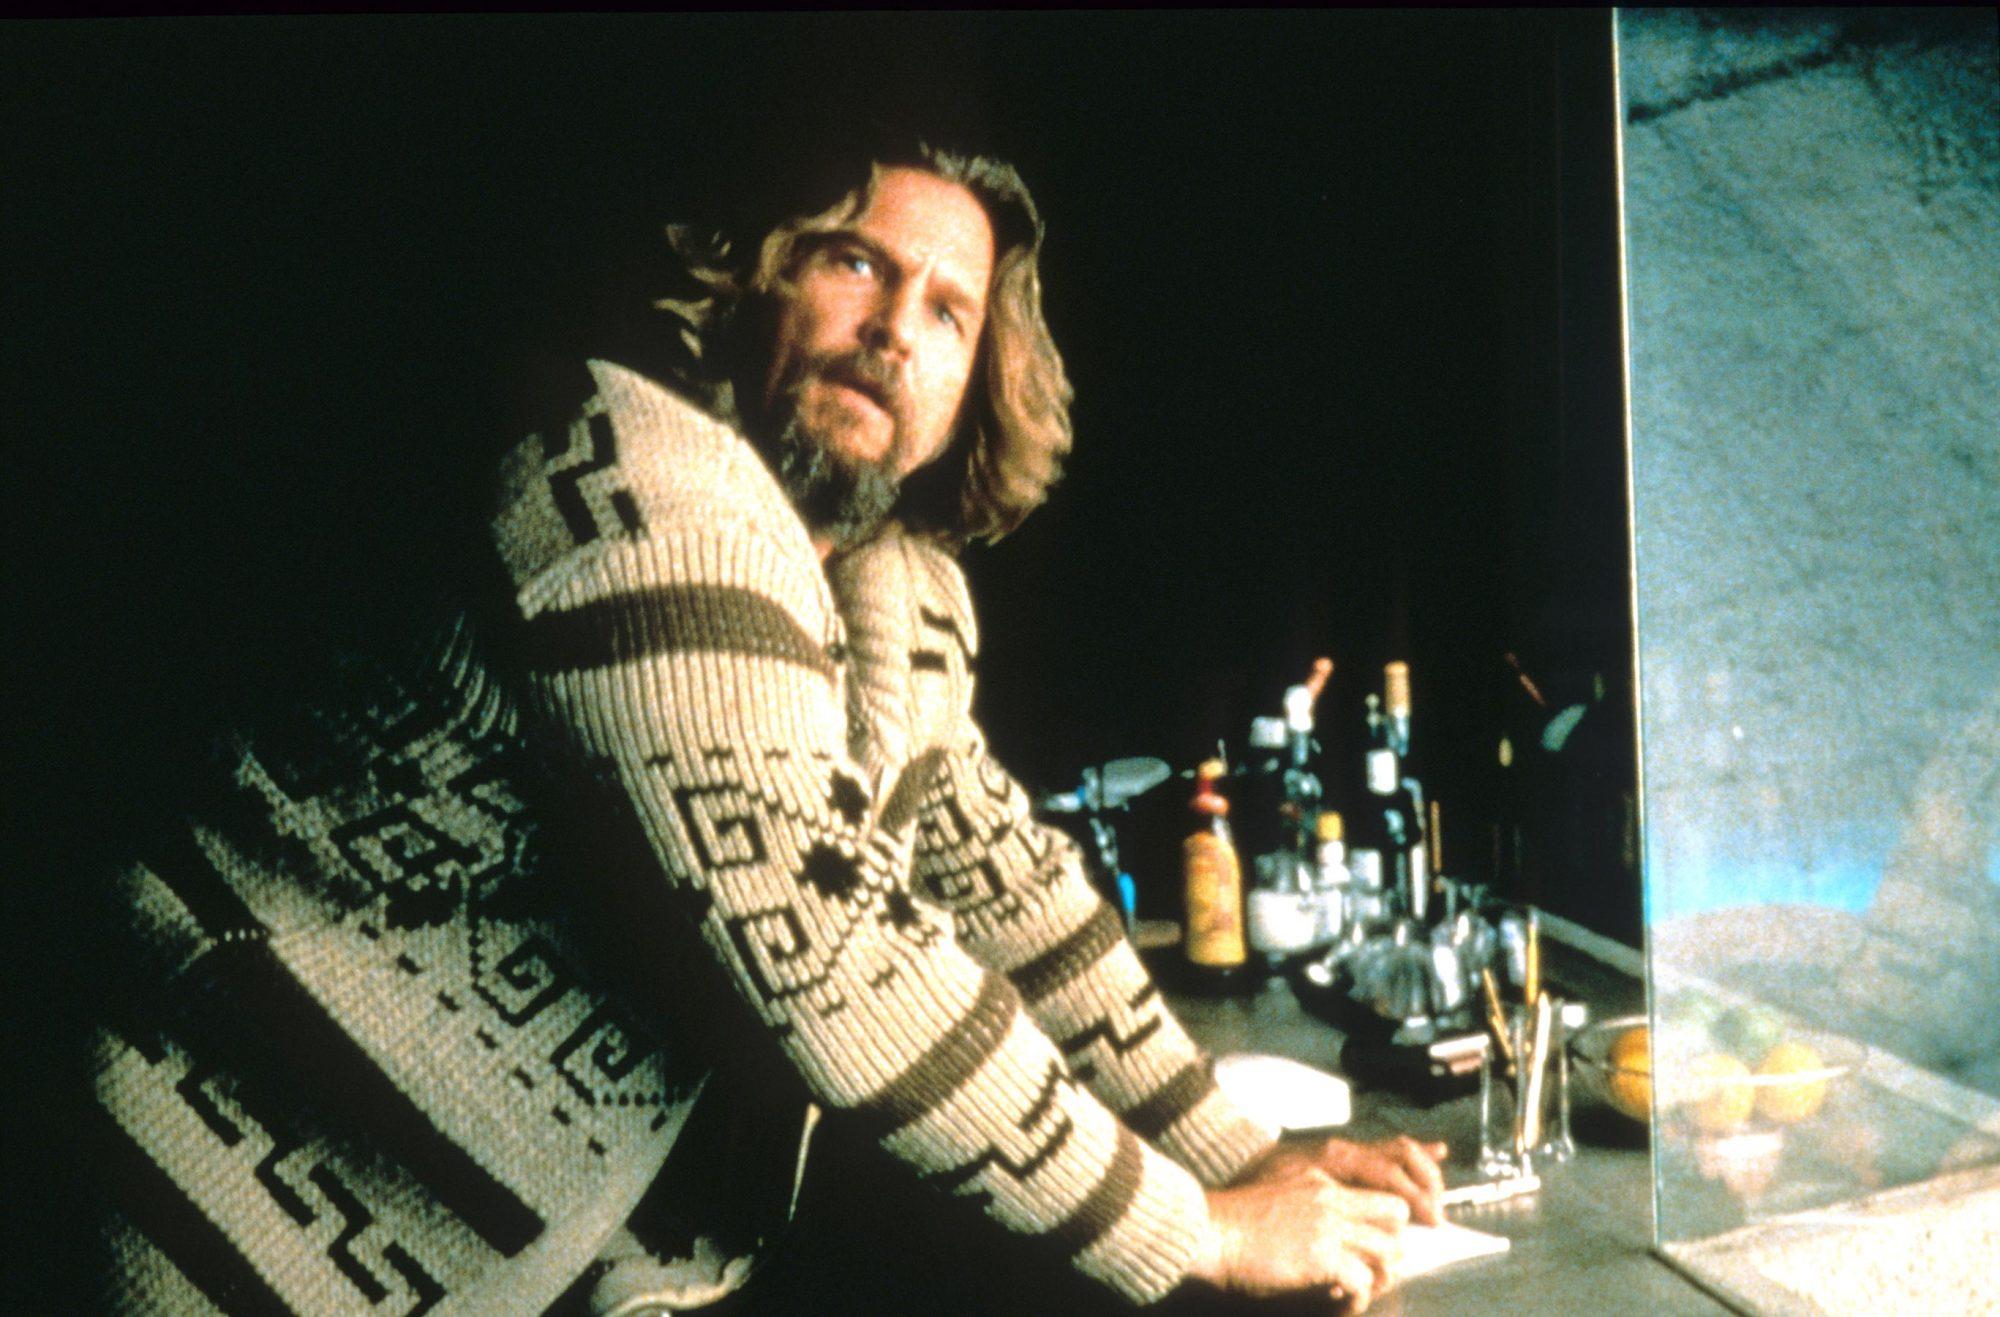 THE BIG LEBOWSKI, Jeff Bridges, 1998, © Gramercy Pictures/courtesy Everett Collection